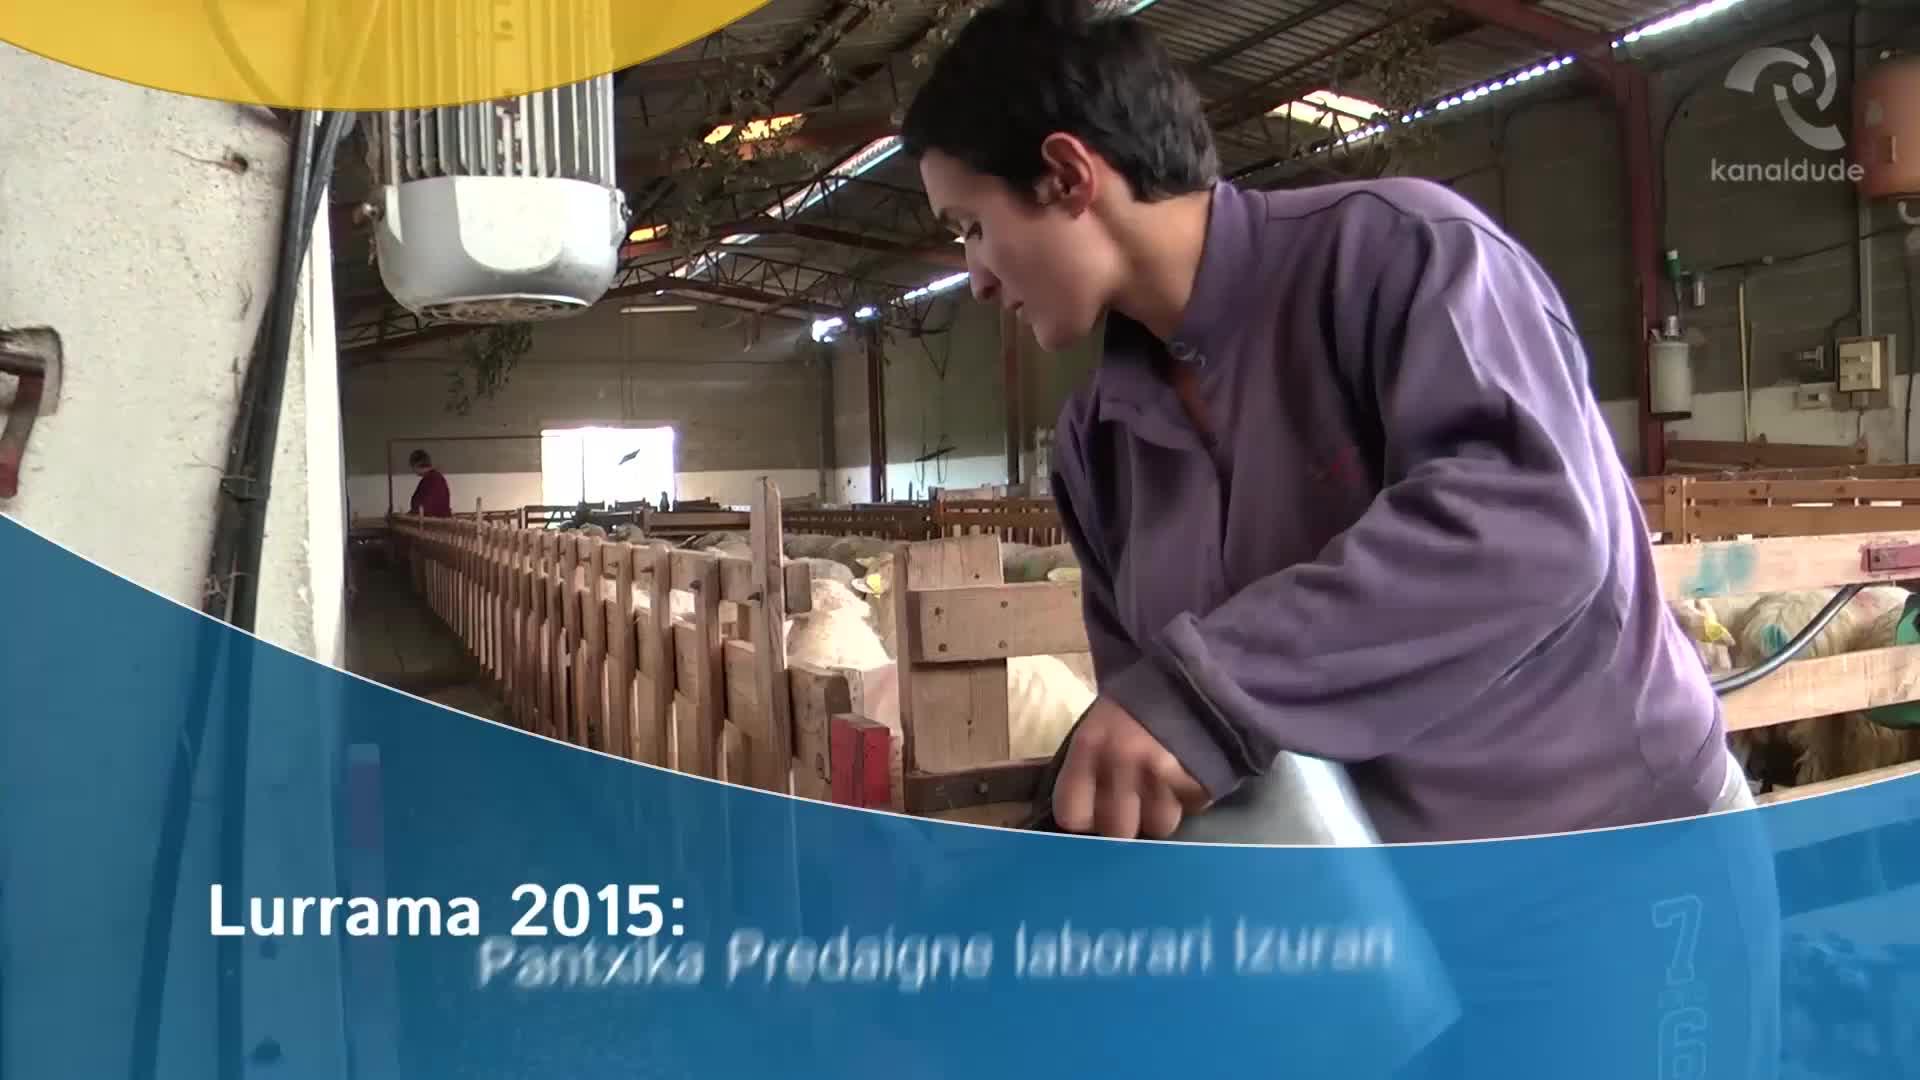 Lurrama 2015: Pantxika Predaigne laborari Izuran